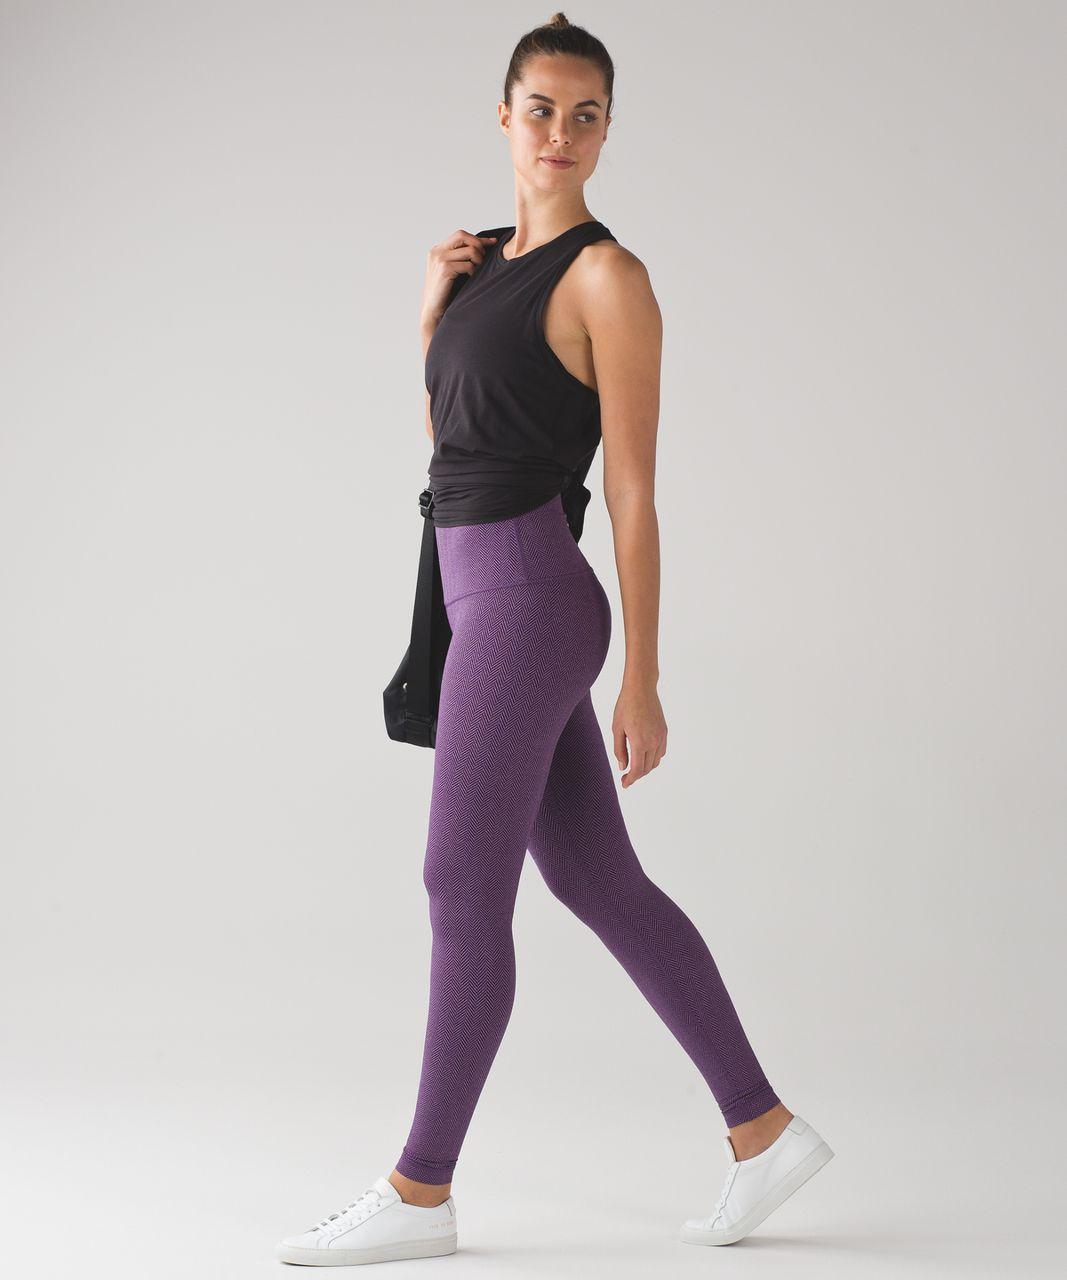 Lululemon Wunder Under Pant (Hi-Rise) (Luxtreme) - Giant Herringbone Black Grape Heathered Tender Violet